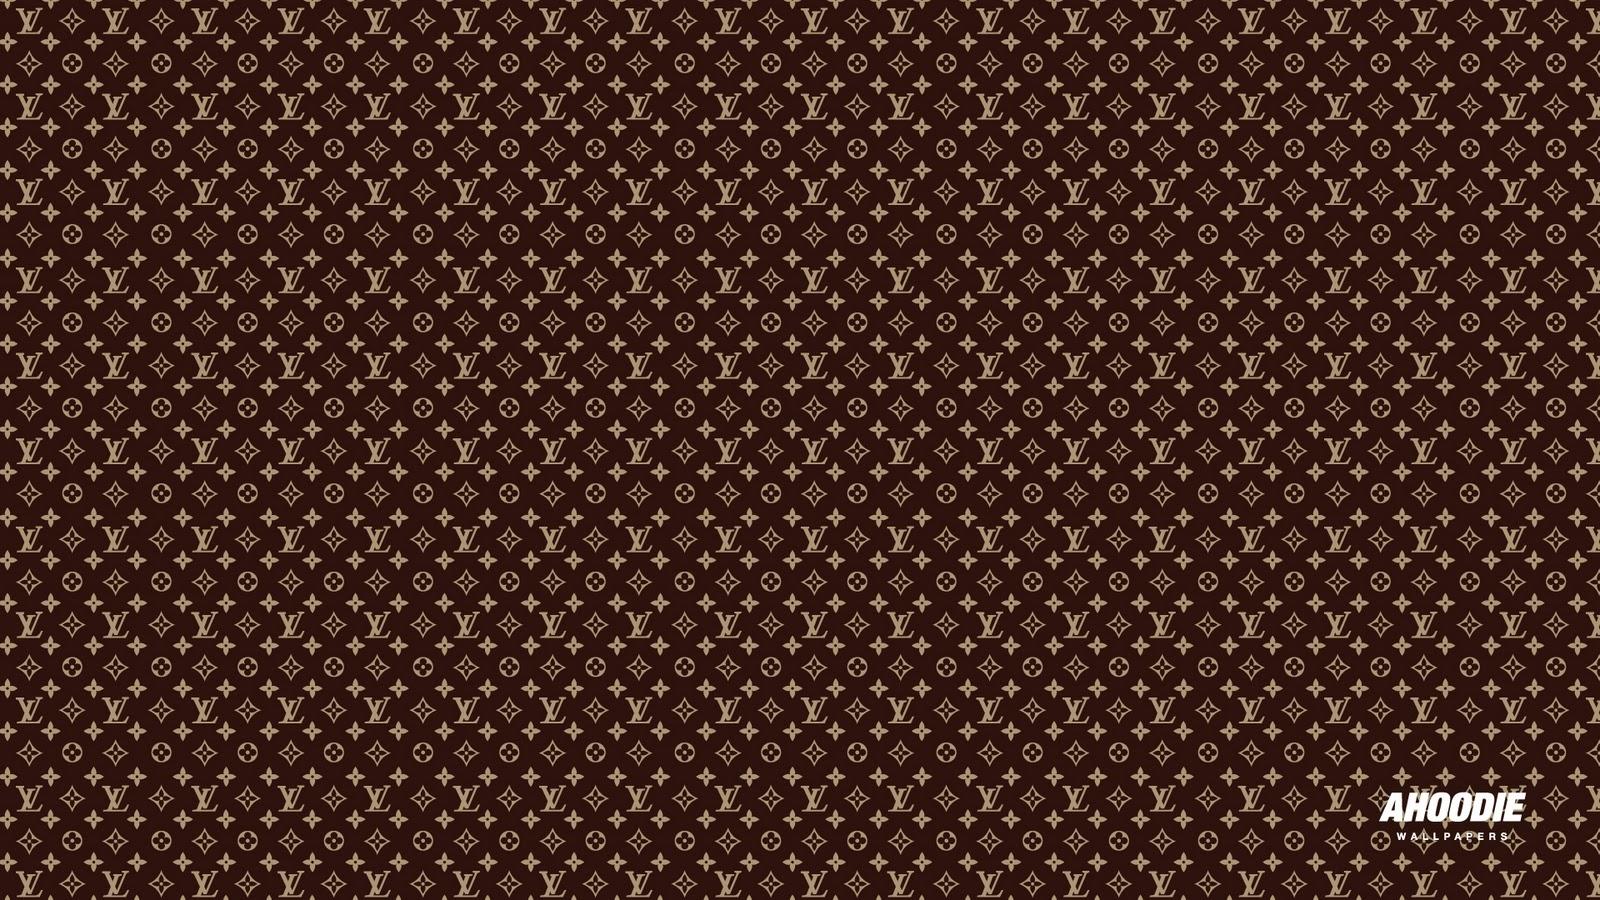 louis vuitton wallpapers hd wallpapersafari